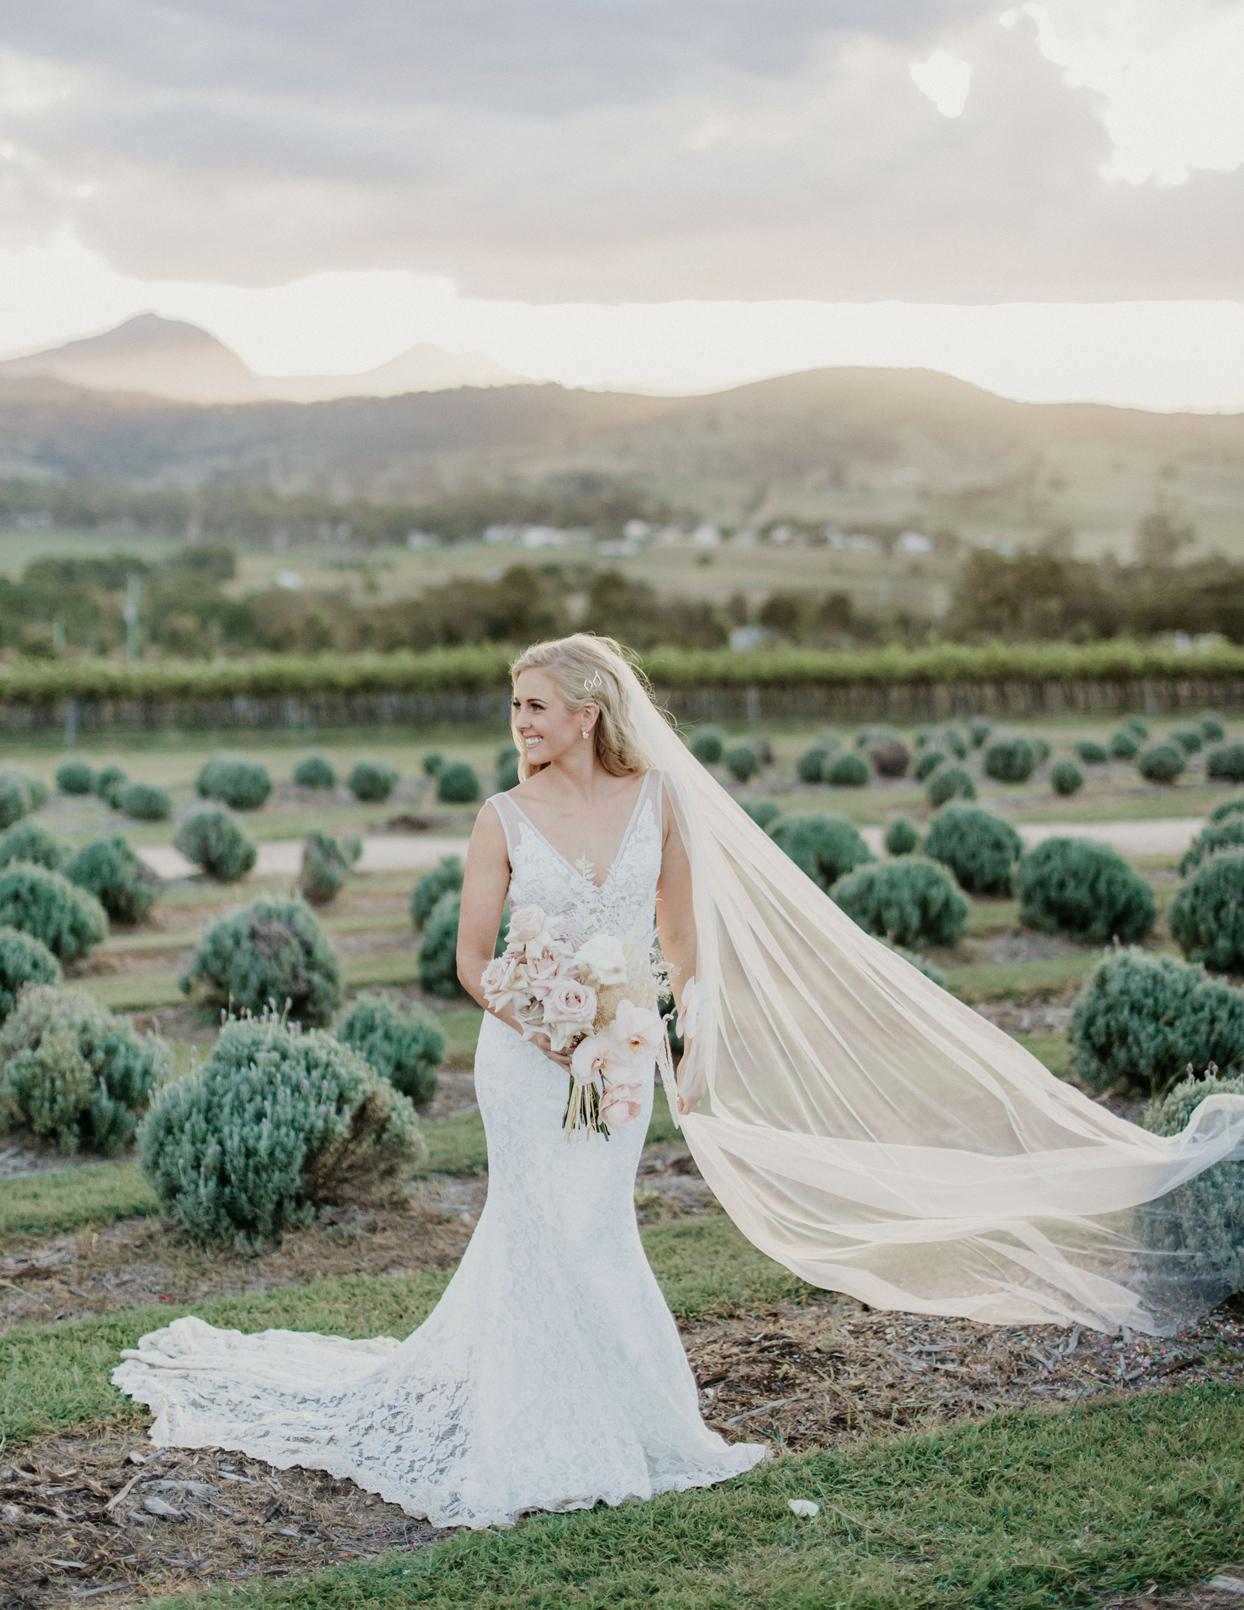 bride holding bouquet in field of greenery